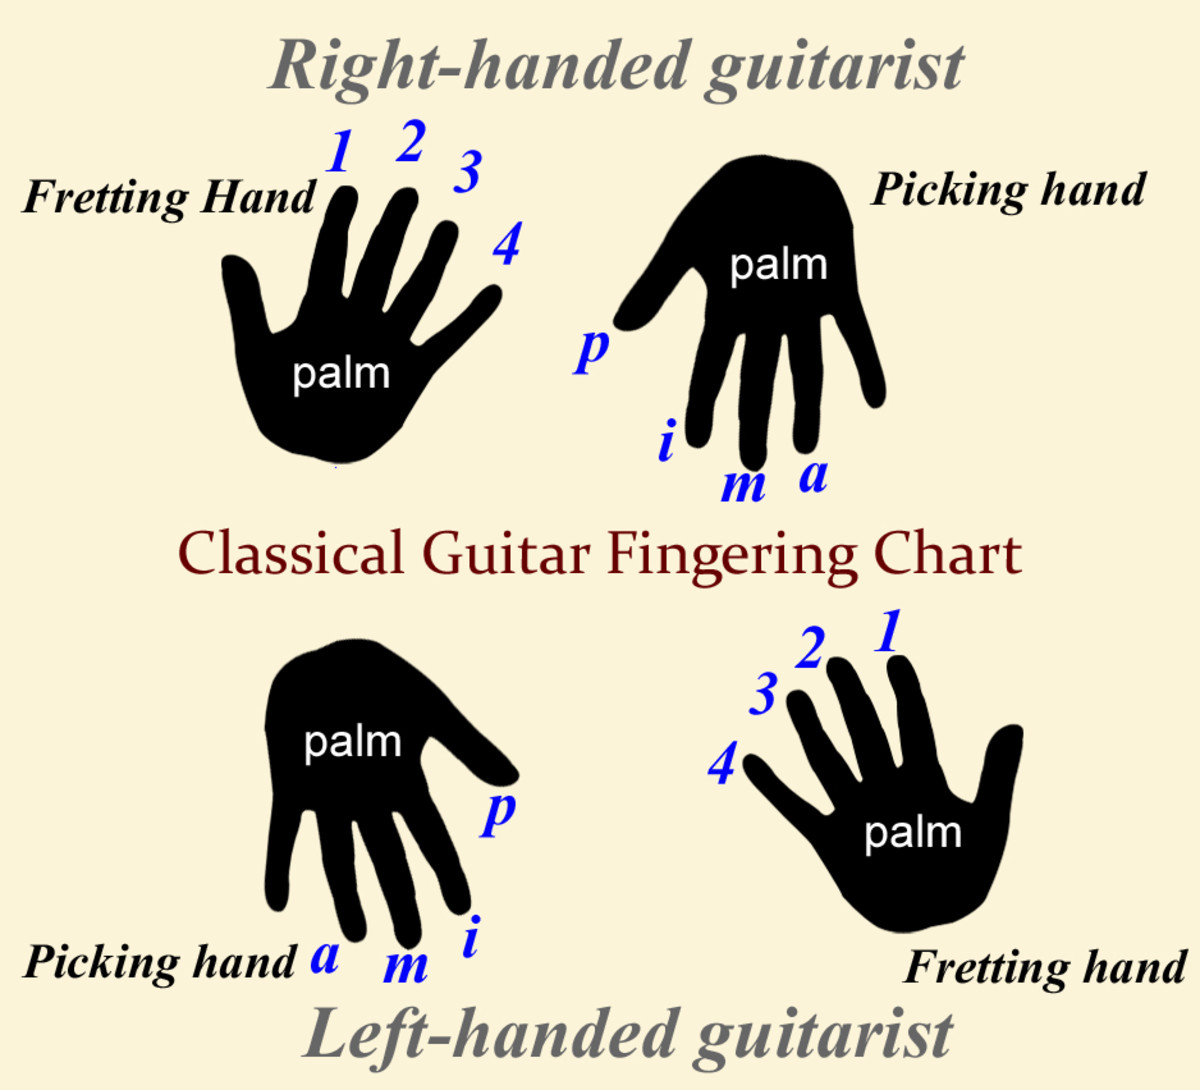 Classical guitar fingering diagram